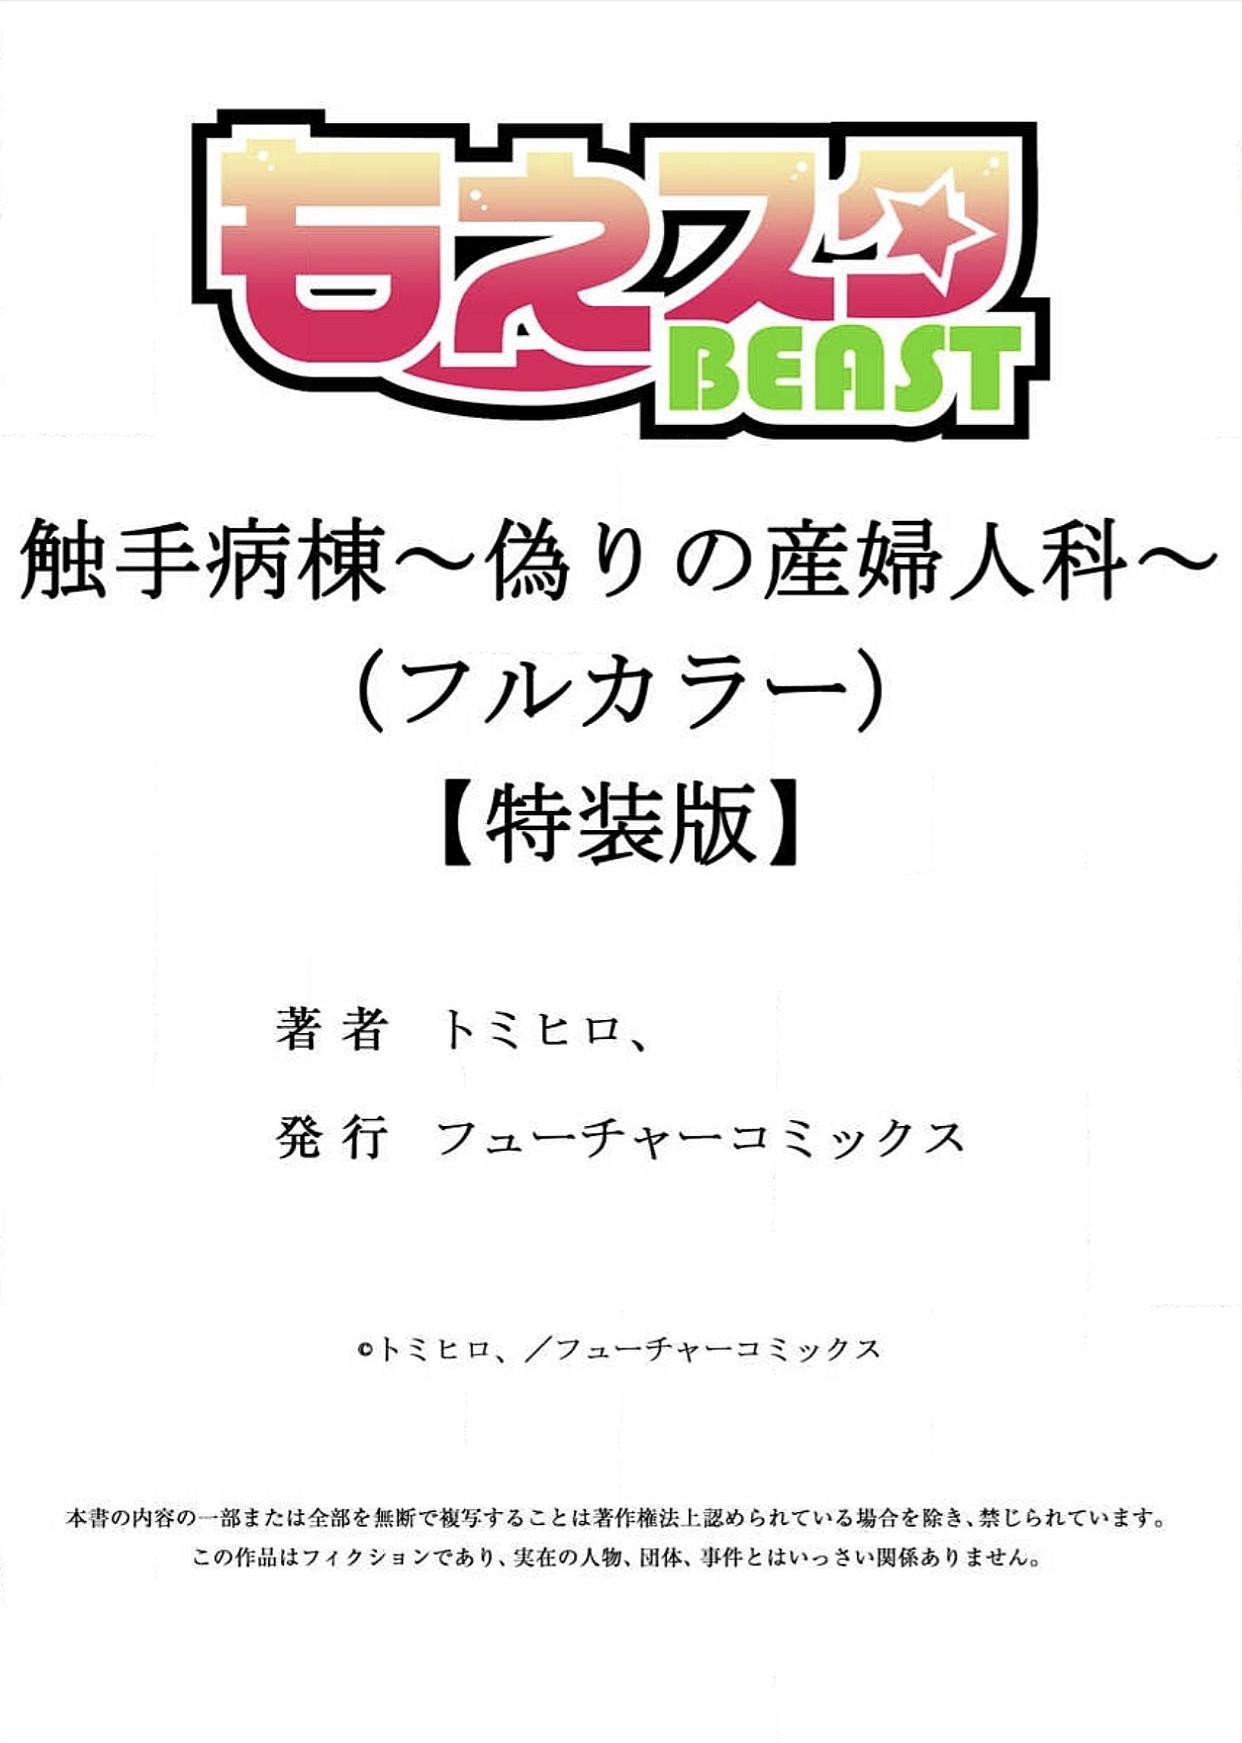 [Tomihero,] Shokushu Byoutou ~Itsuwari no Sanbujinka~ (Full Color) 【Tokusou Han】 [Digital] 146